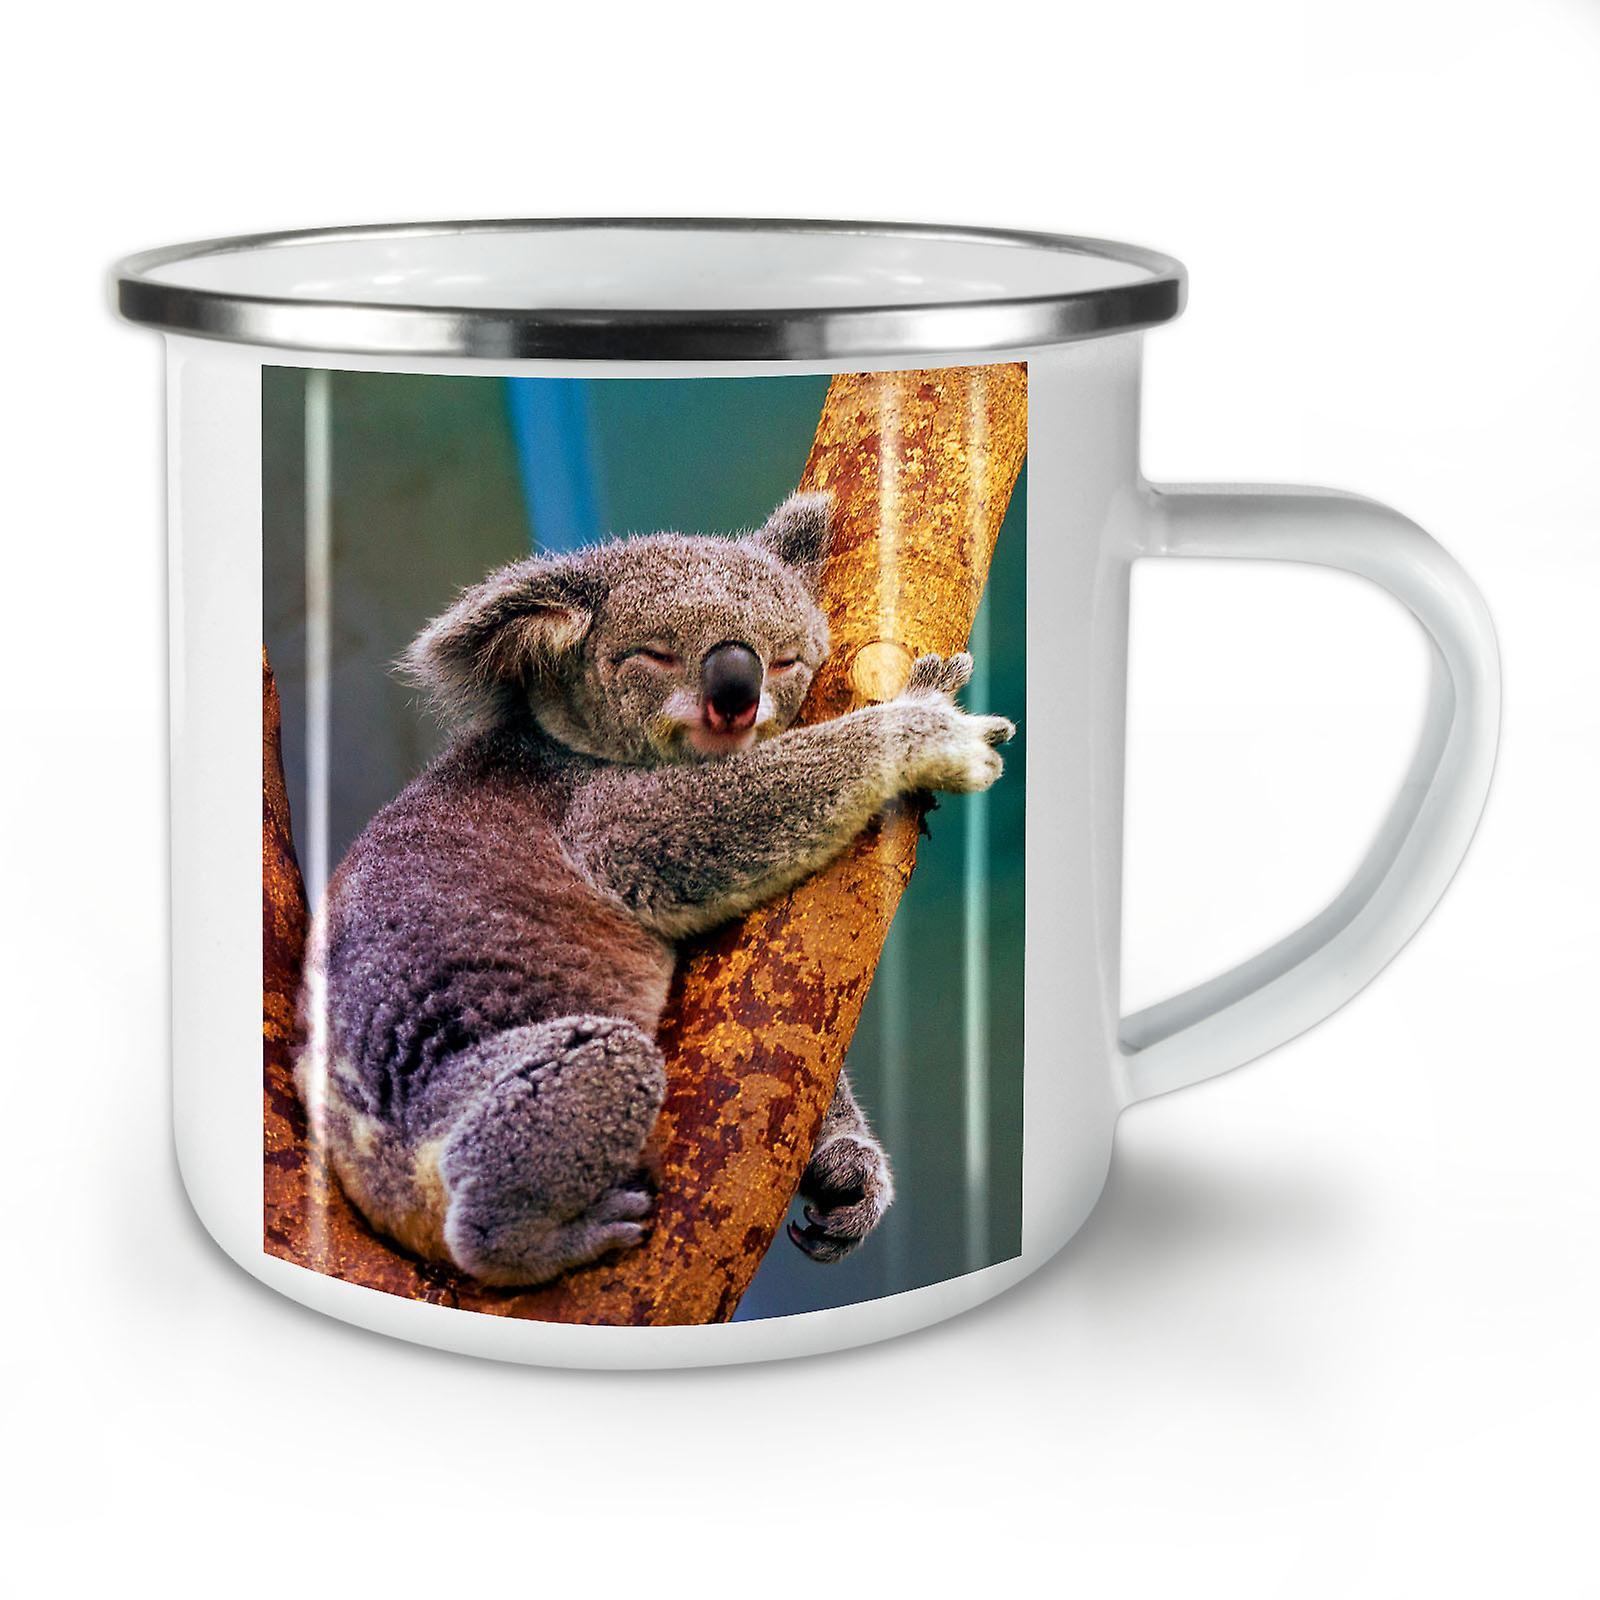 Arbre Whitetea Mug10 Café Nouveau Émail OzWellcoda Koala Sur Un fbyvIY76g